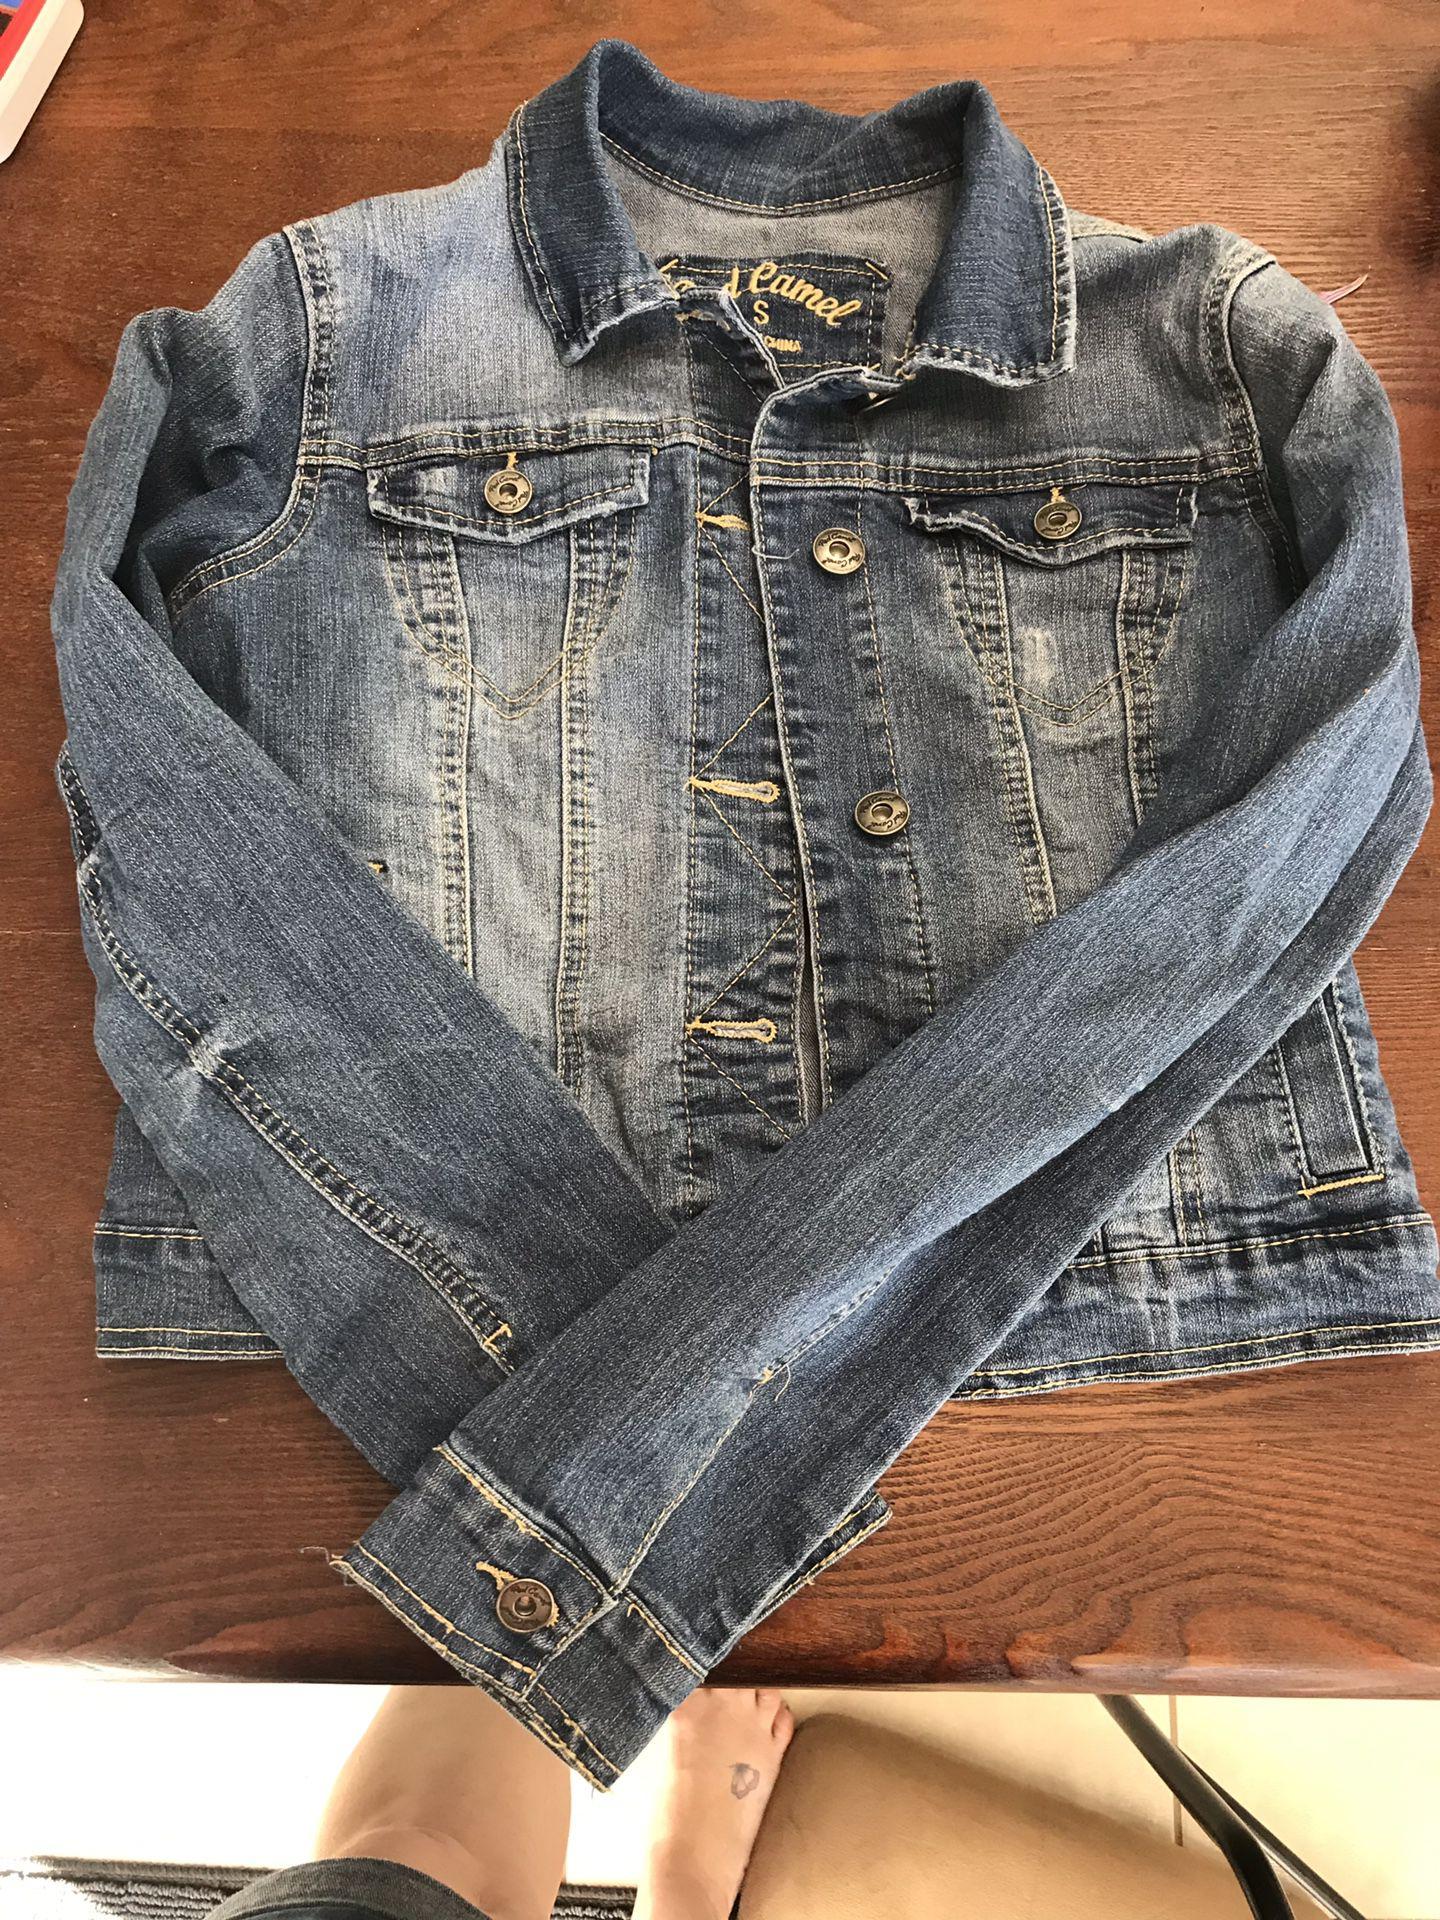 Jean jacket size small